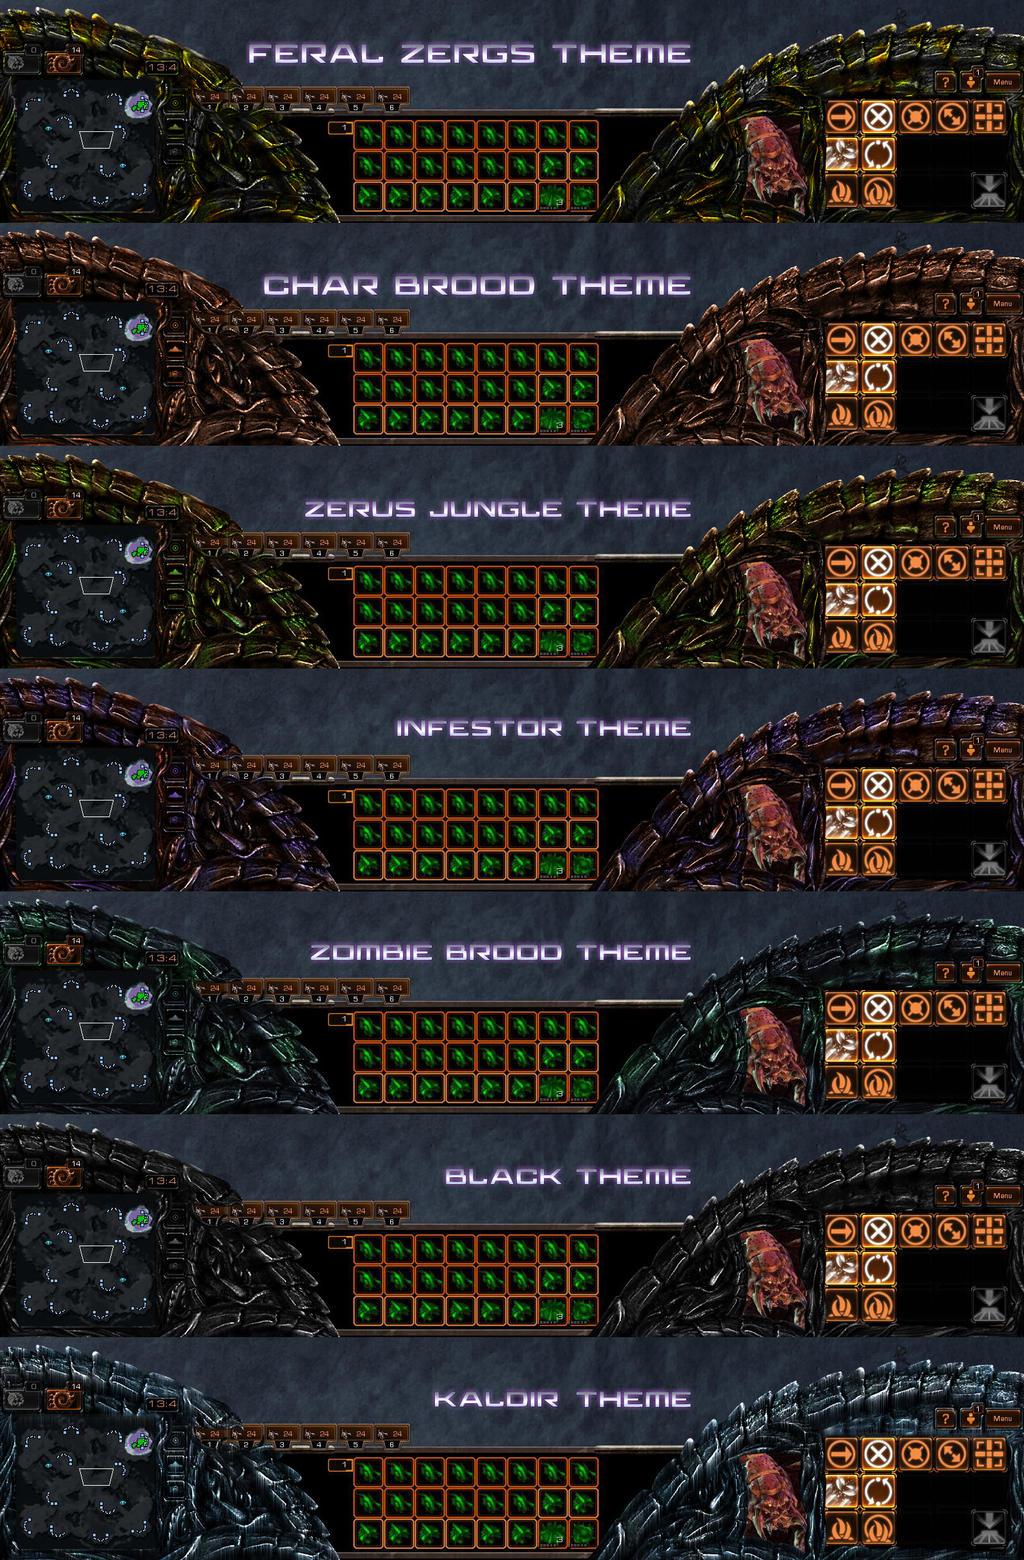 Carapace Overlay (based on Hanzo's Overlay)